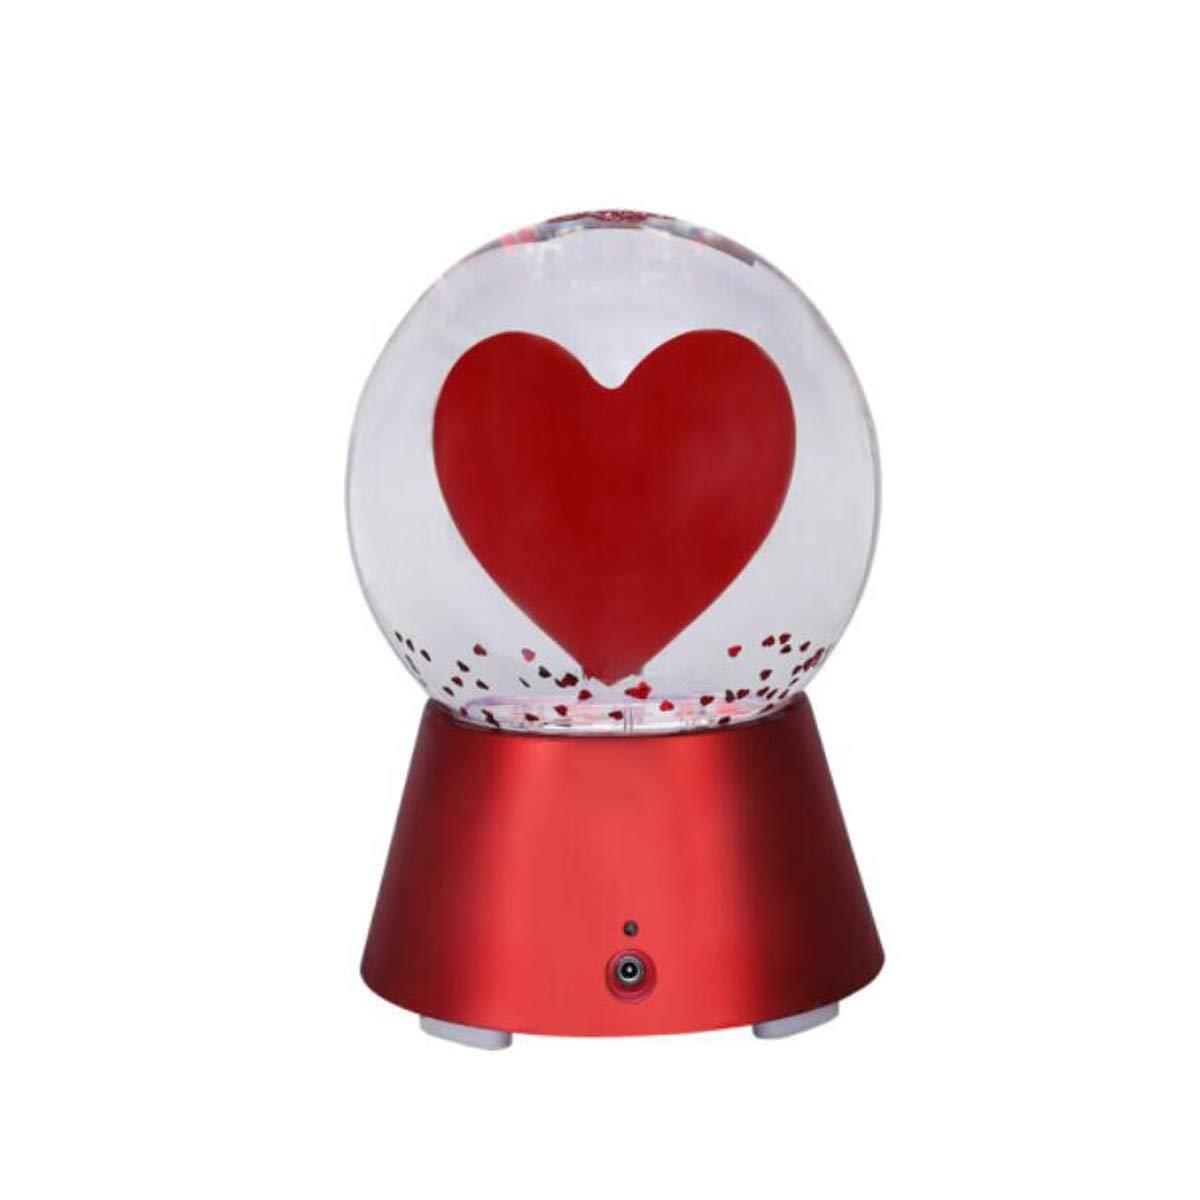 Boyuanweiye スピーカー、ラブクリスタルボール、Bluetoothステレオナイトライト、USBクリエイティブバレンタインデーホリデーギフト 可愛い (Color : Red)   B07RHRWZ6S